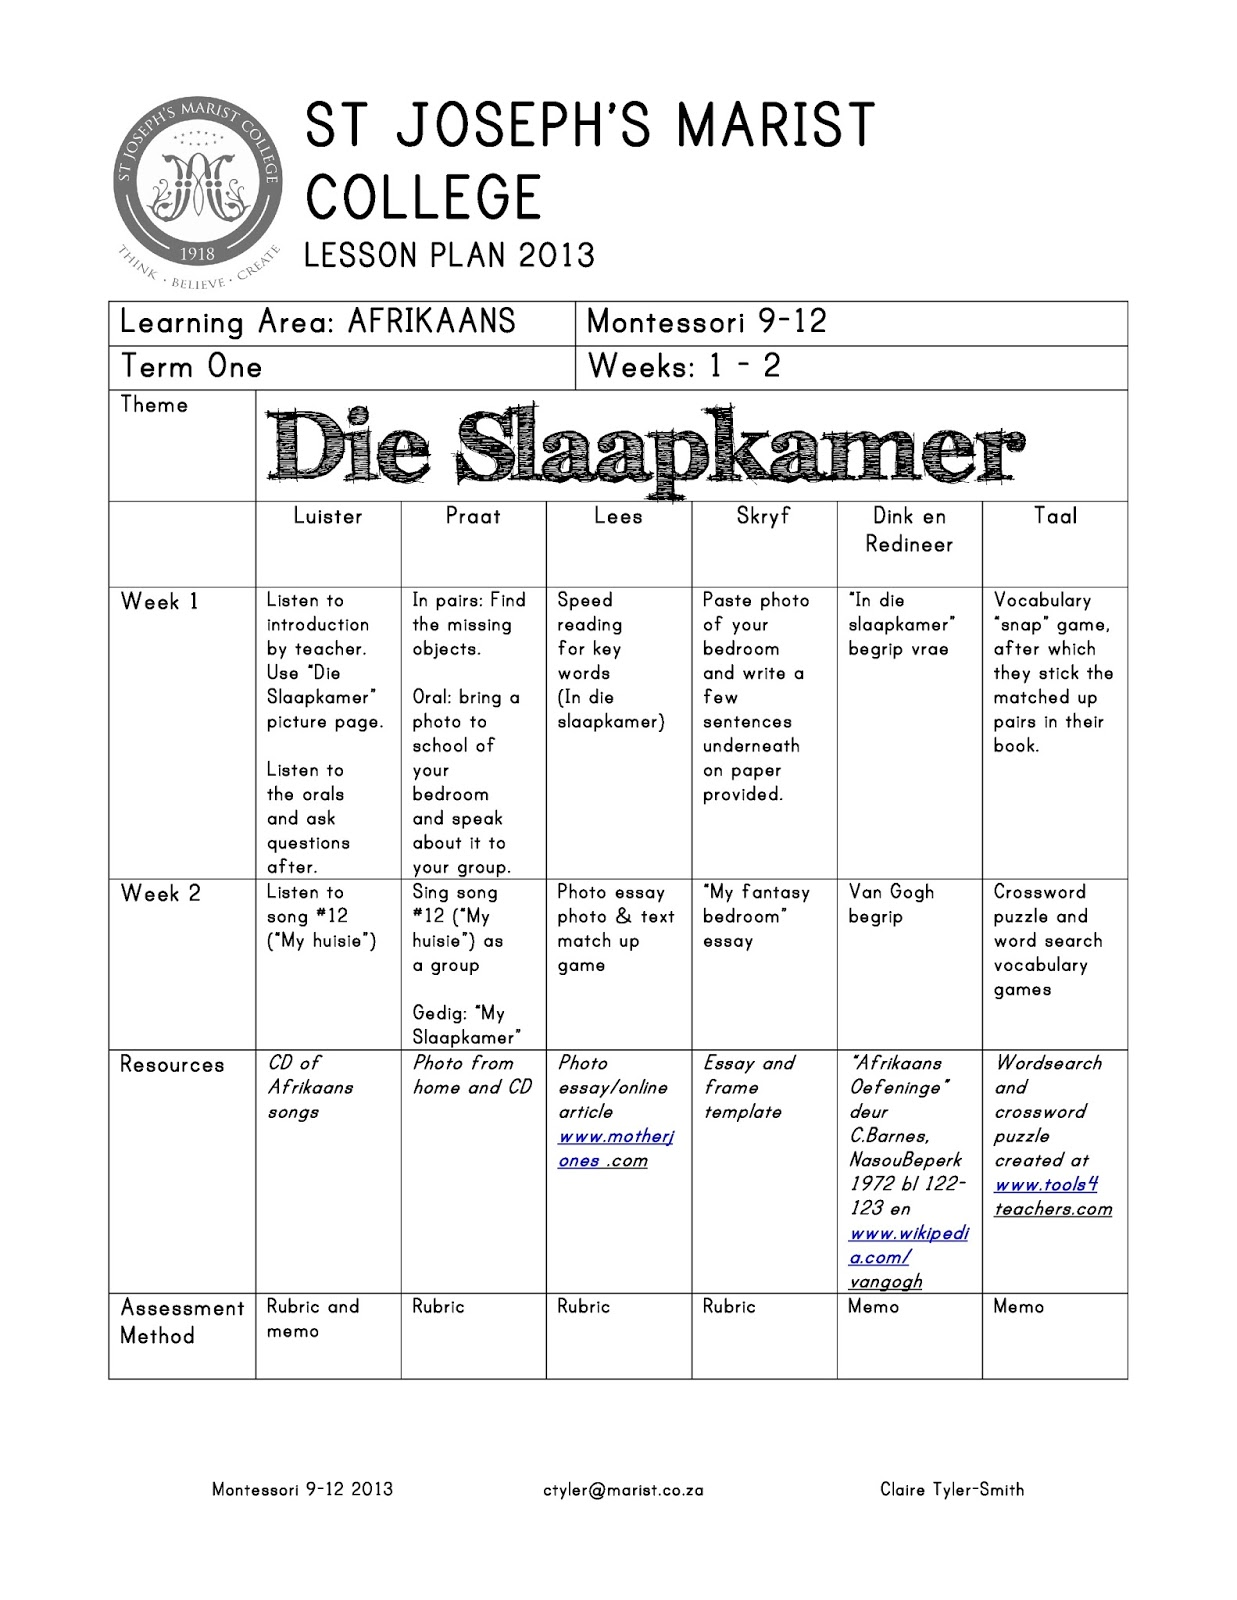 Afrikaans grammar - Wikipedia, the free encyclopedia